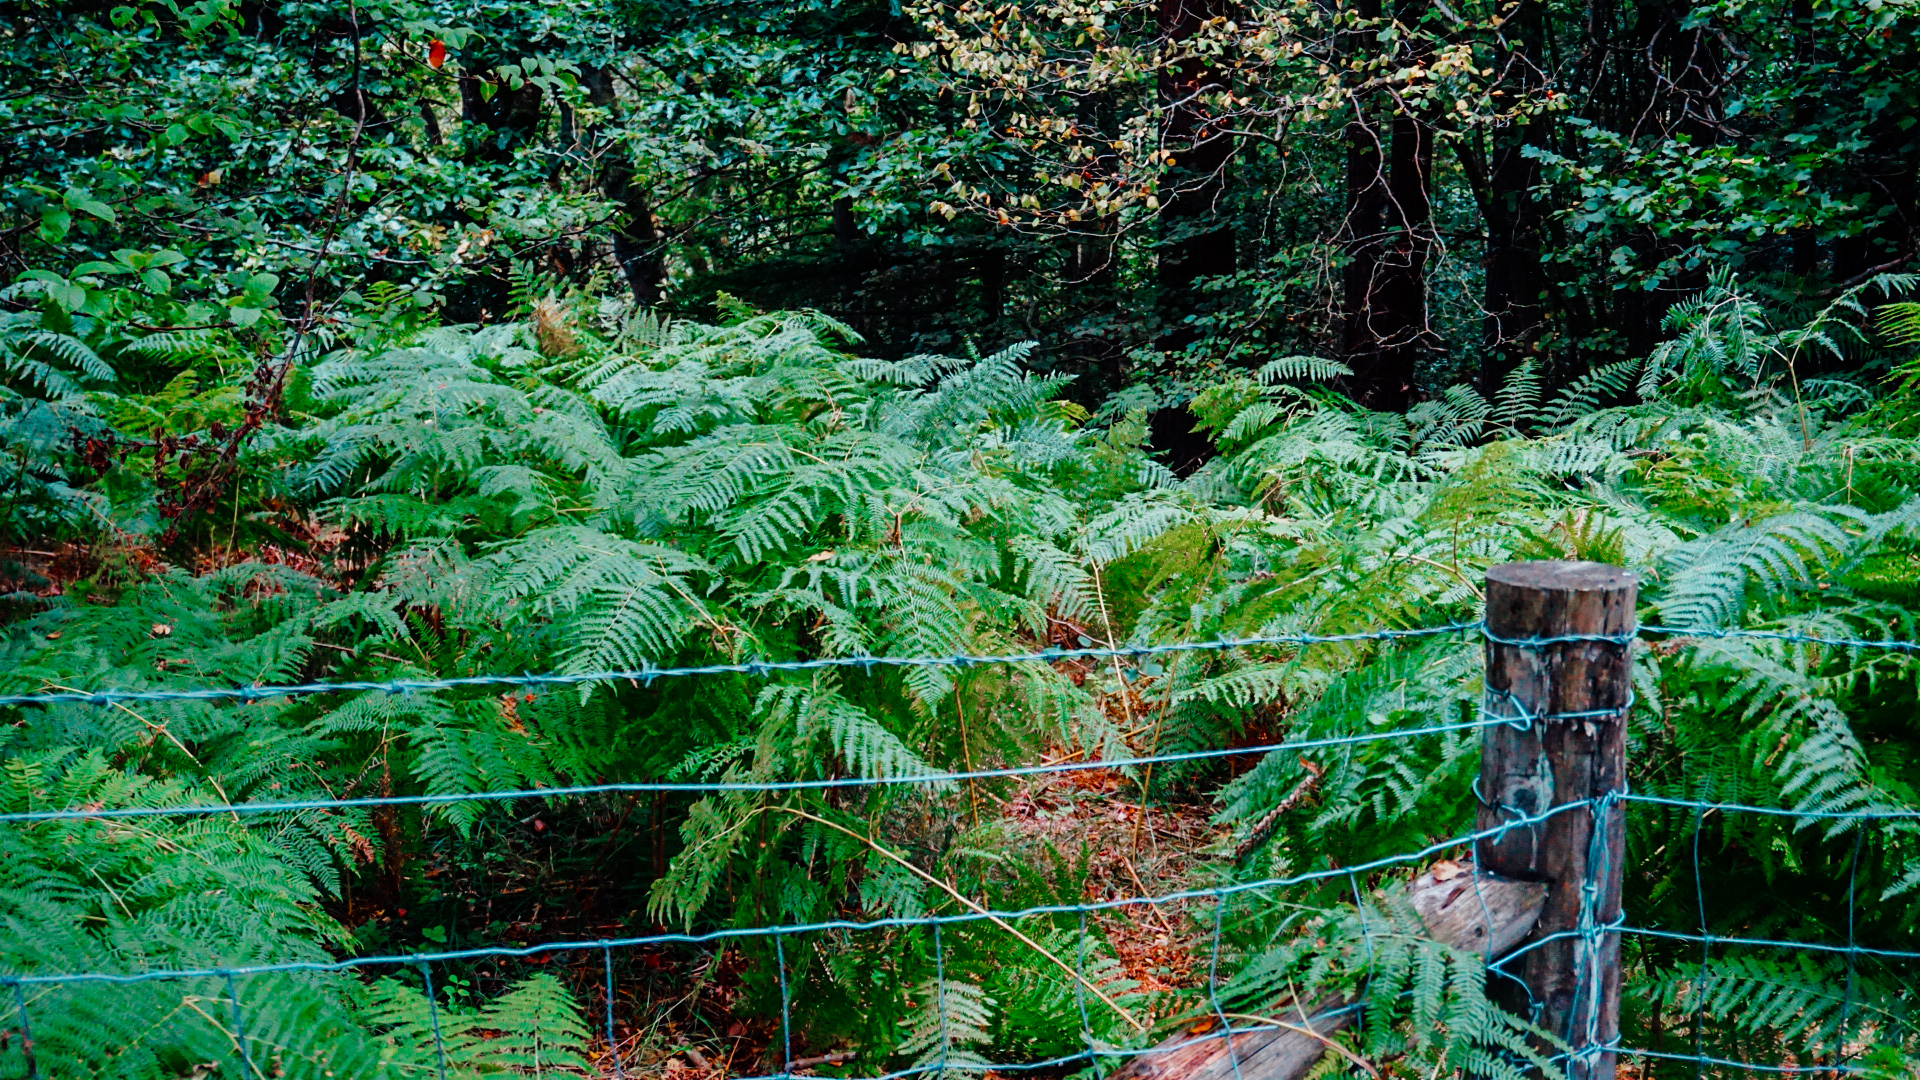 Mallyan Spout Waterfall North York Moors